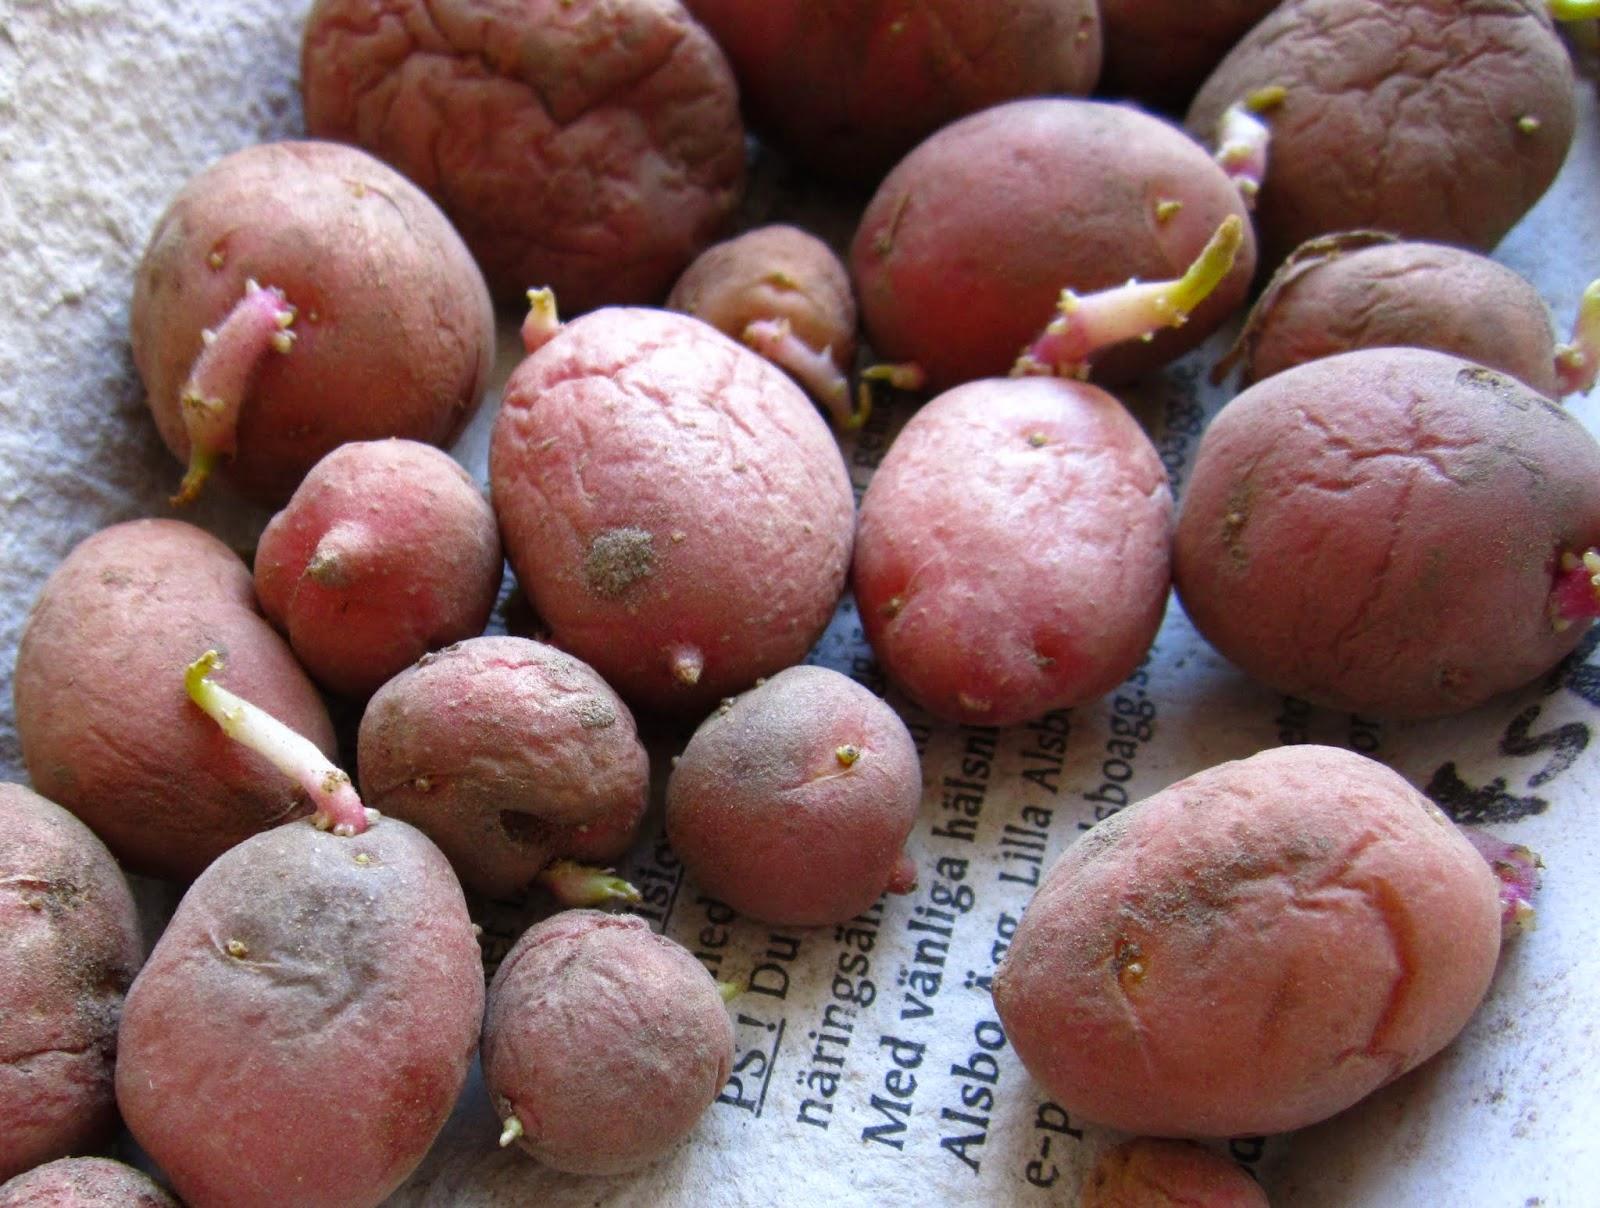 sättpotatis asterix, Odla egen mat, potatisodling, ekologiskt